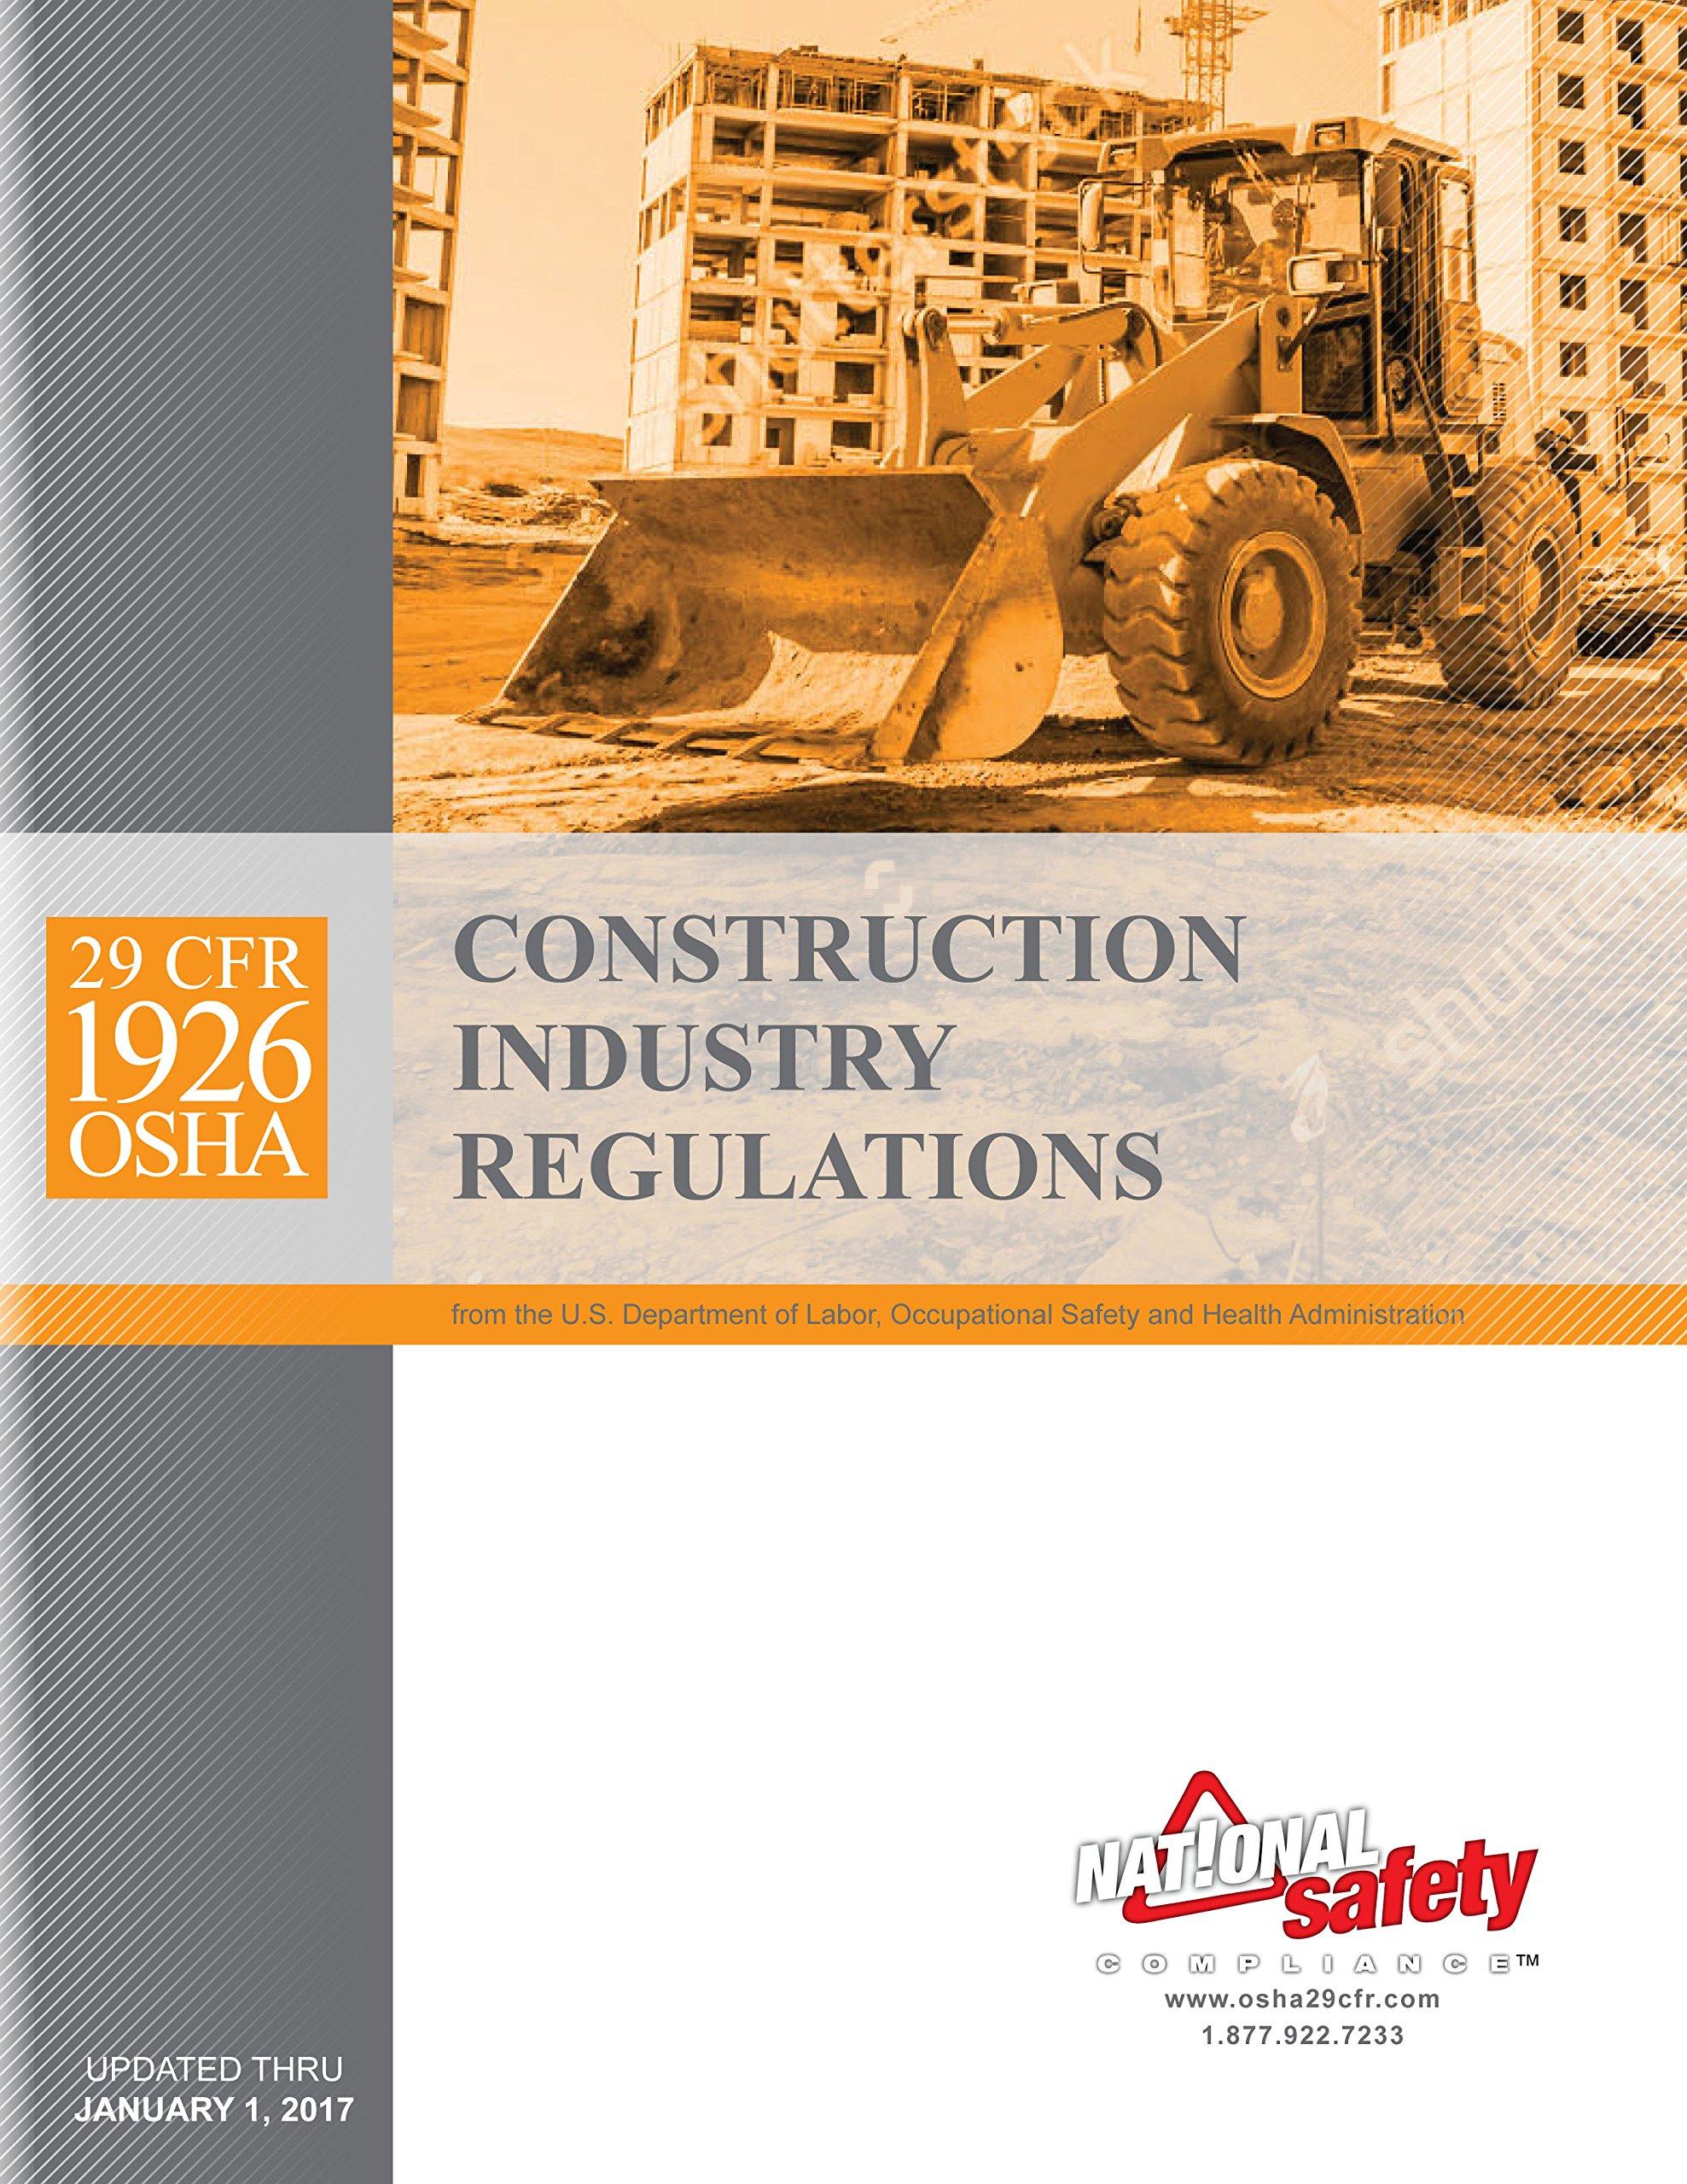 JANUARY 2017 Edition 29 CFR 1926 OSHA Construction Industry Regulations:  Amazon.com: Books